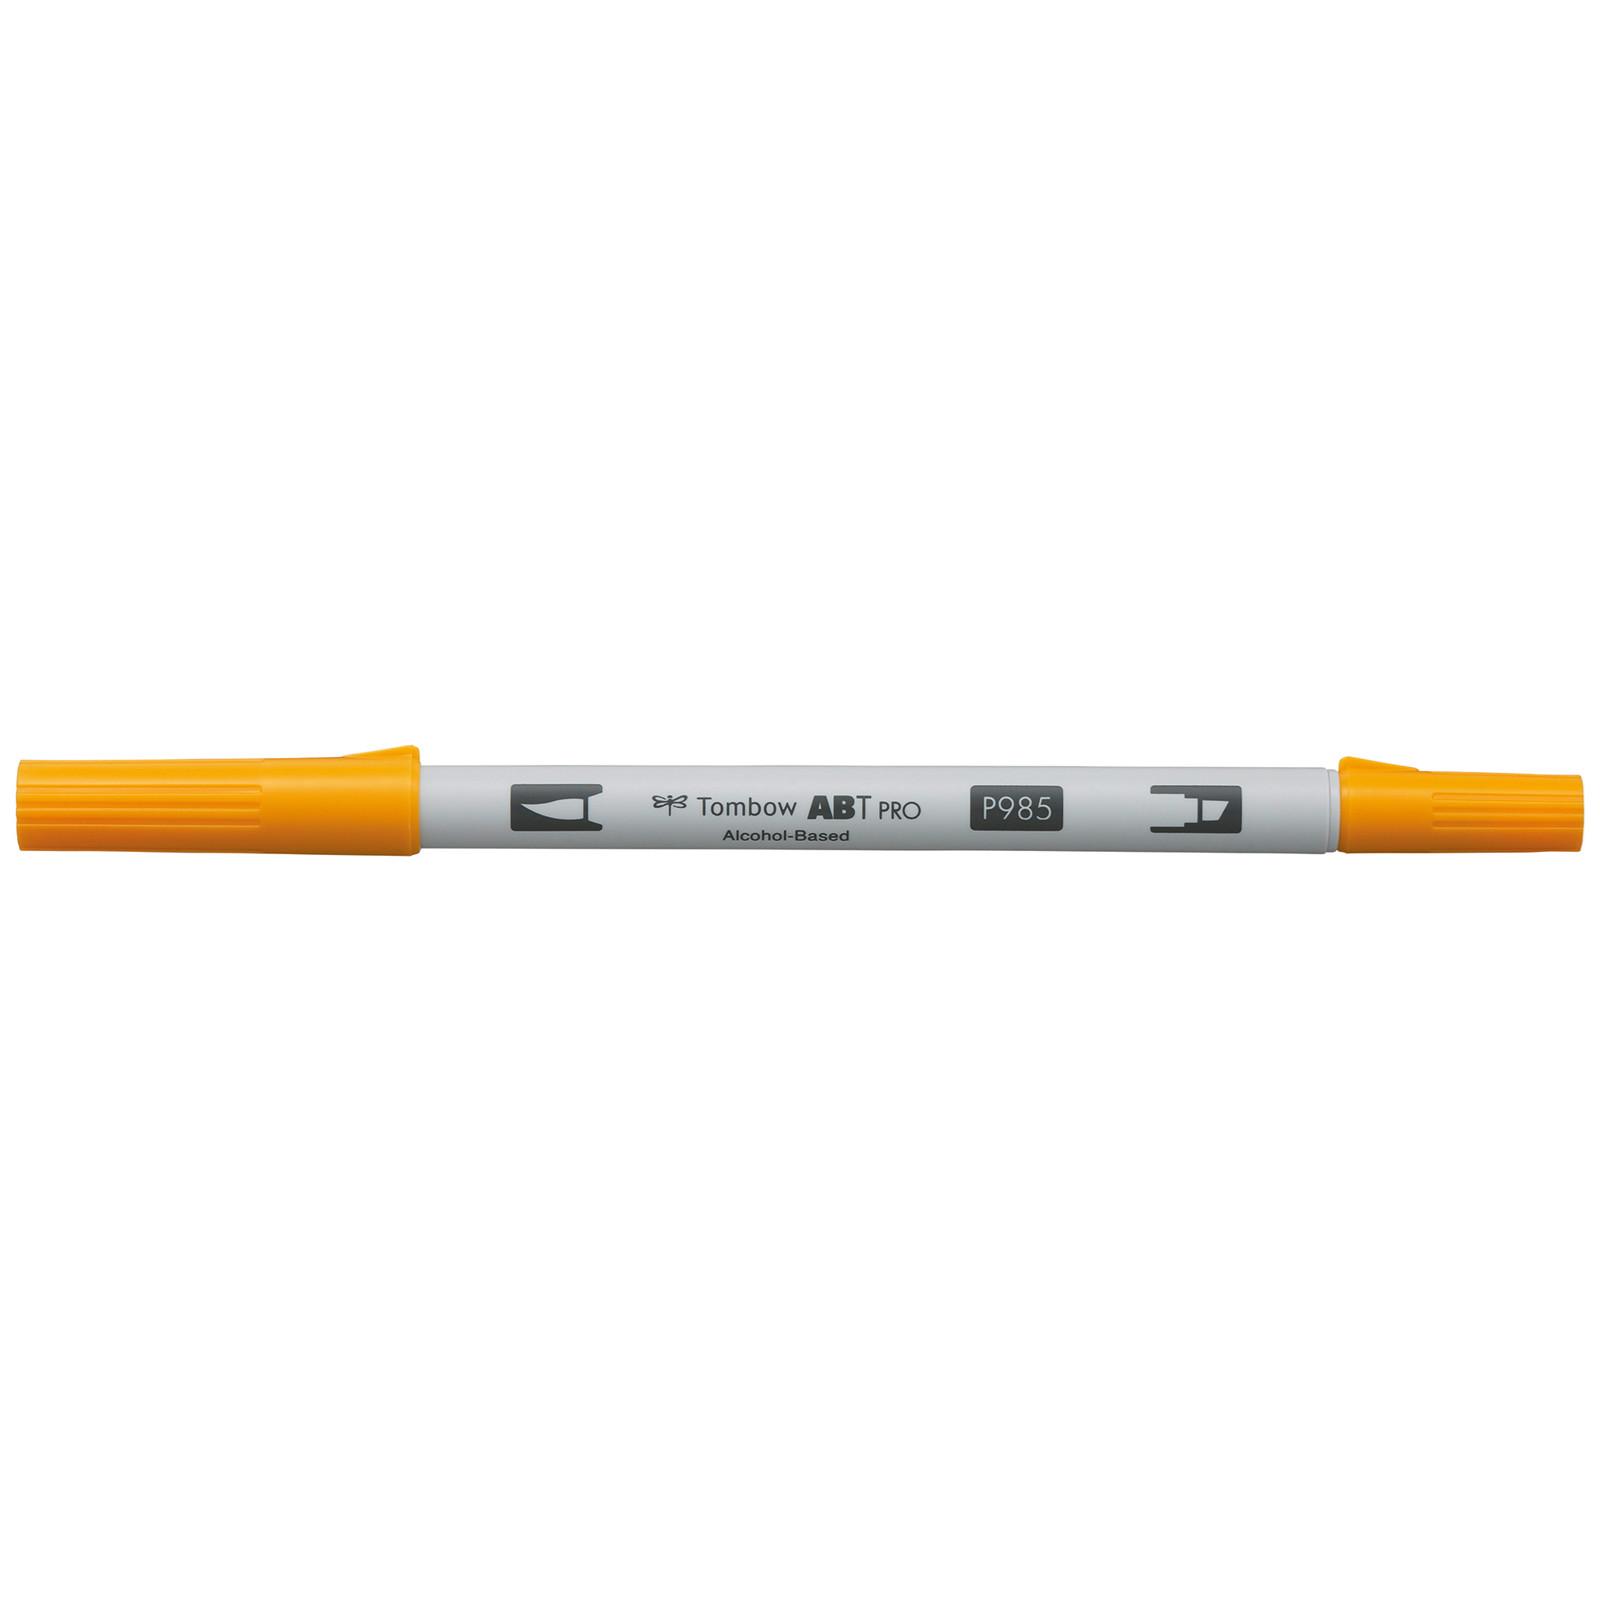 Tombow Marker alcohol-based ABT PRO Dual Brush 985 chrome yellow